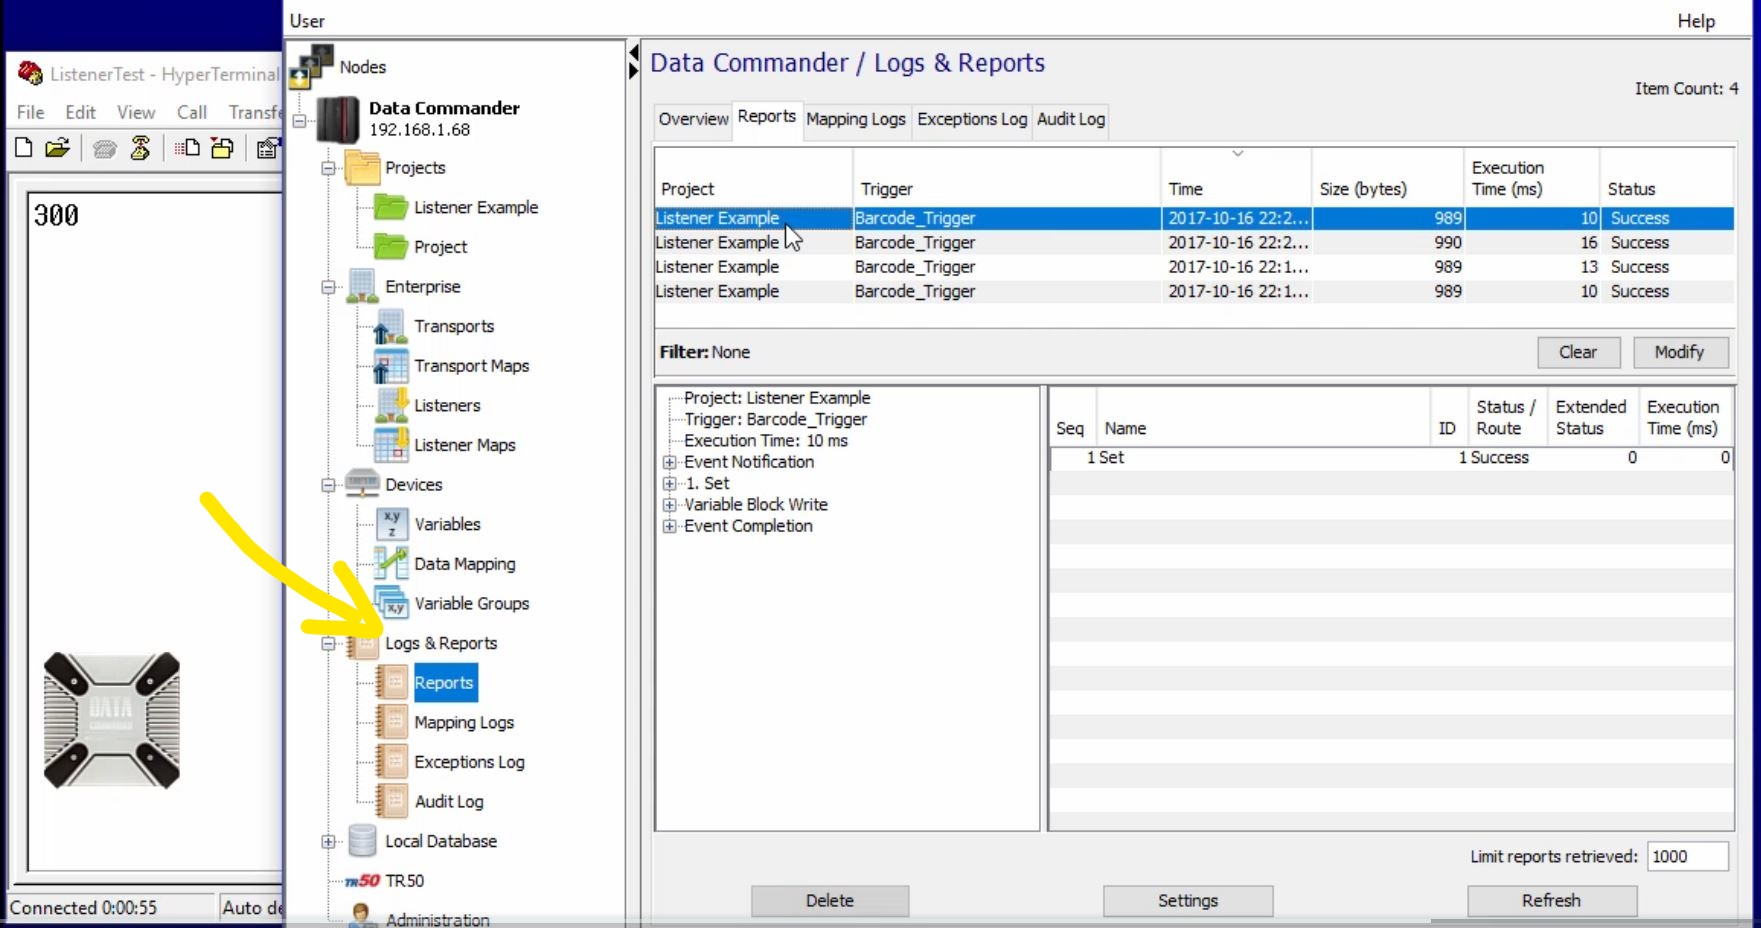 Data Commander's Logging capabilities